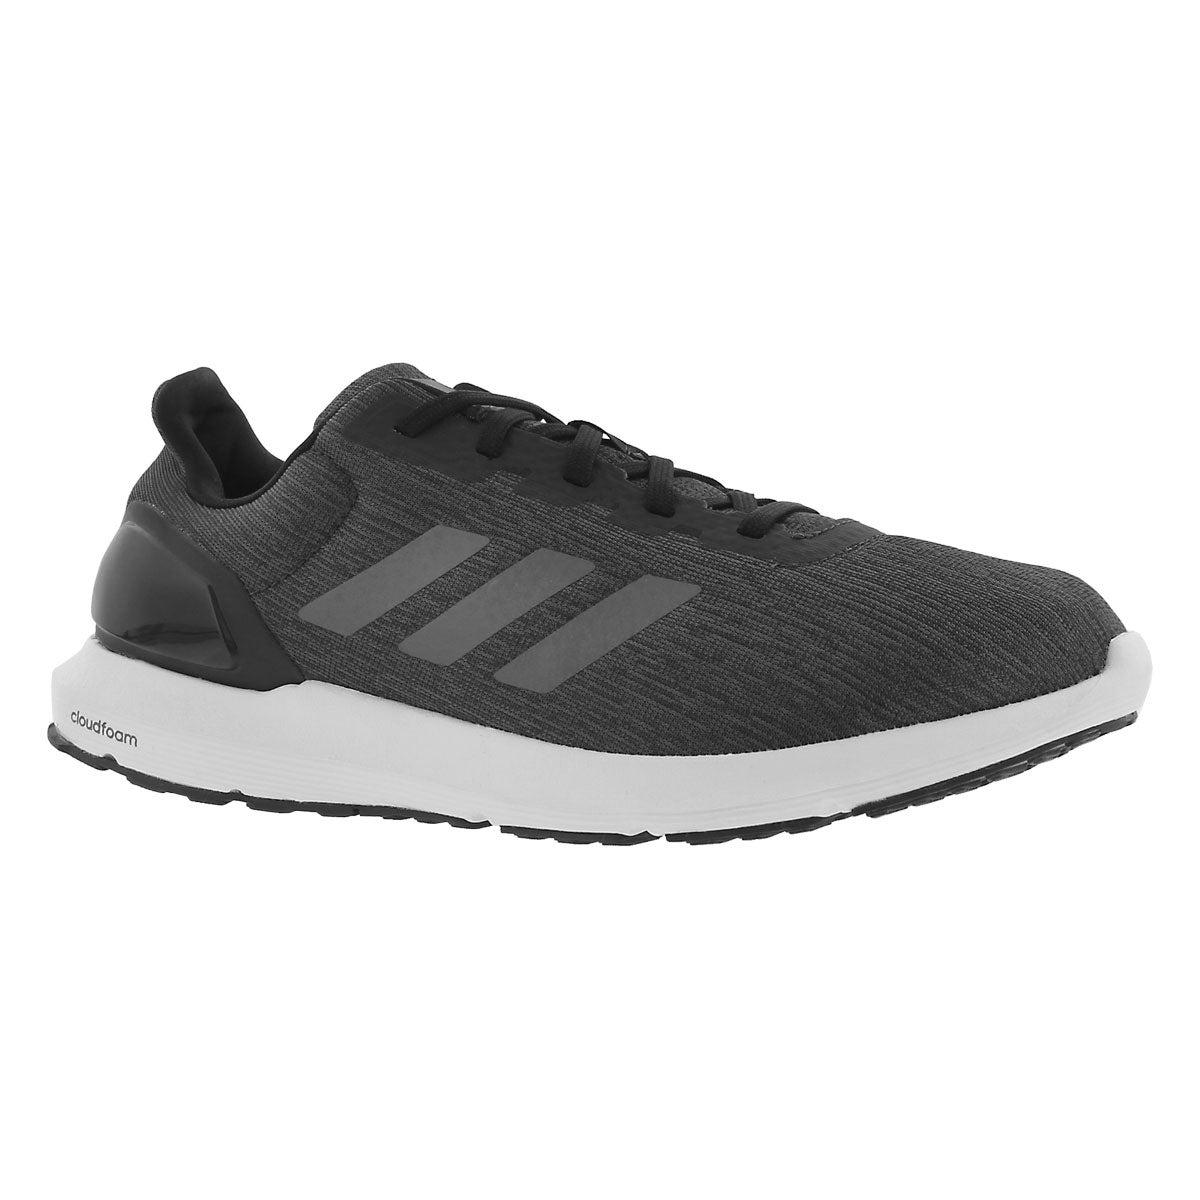 Men's COSMIC 2 black/black running shoes